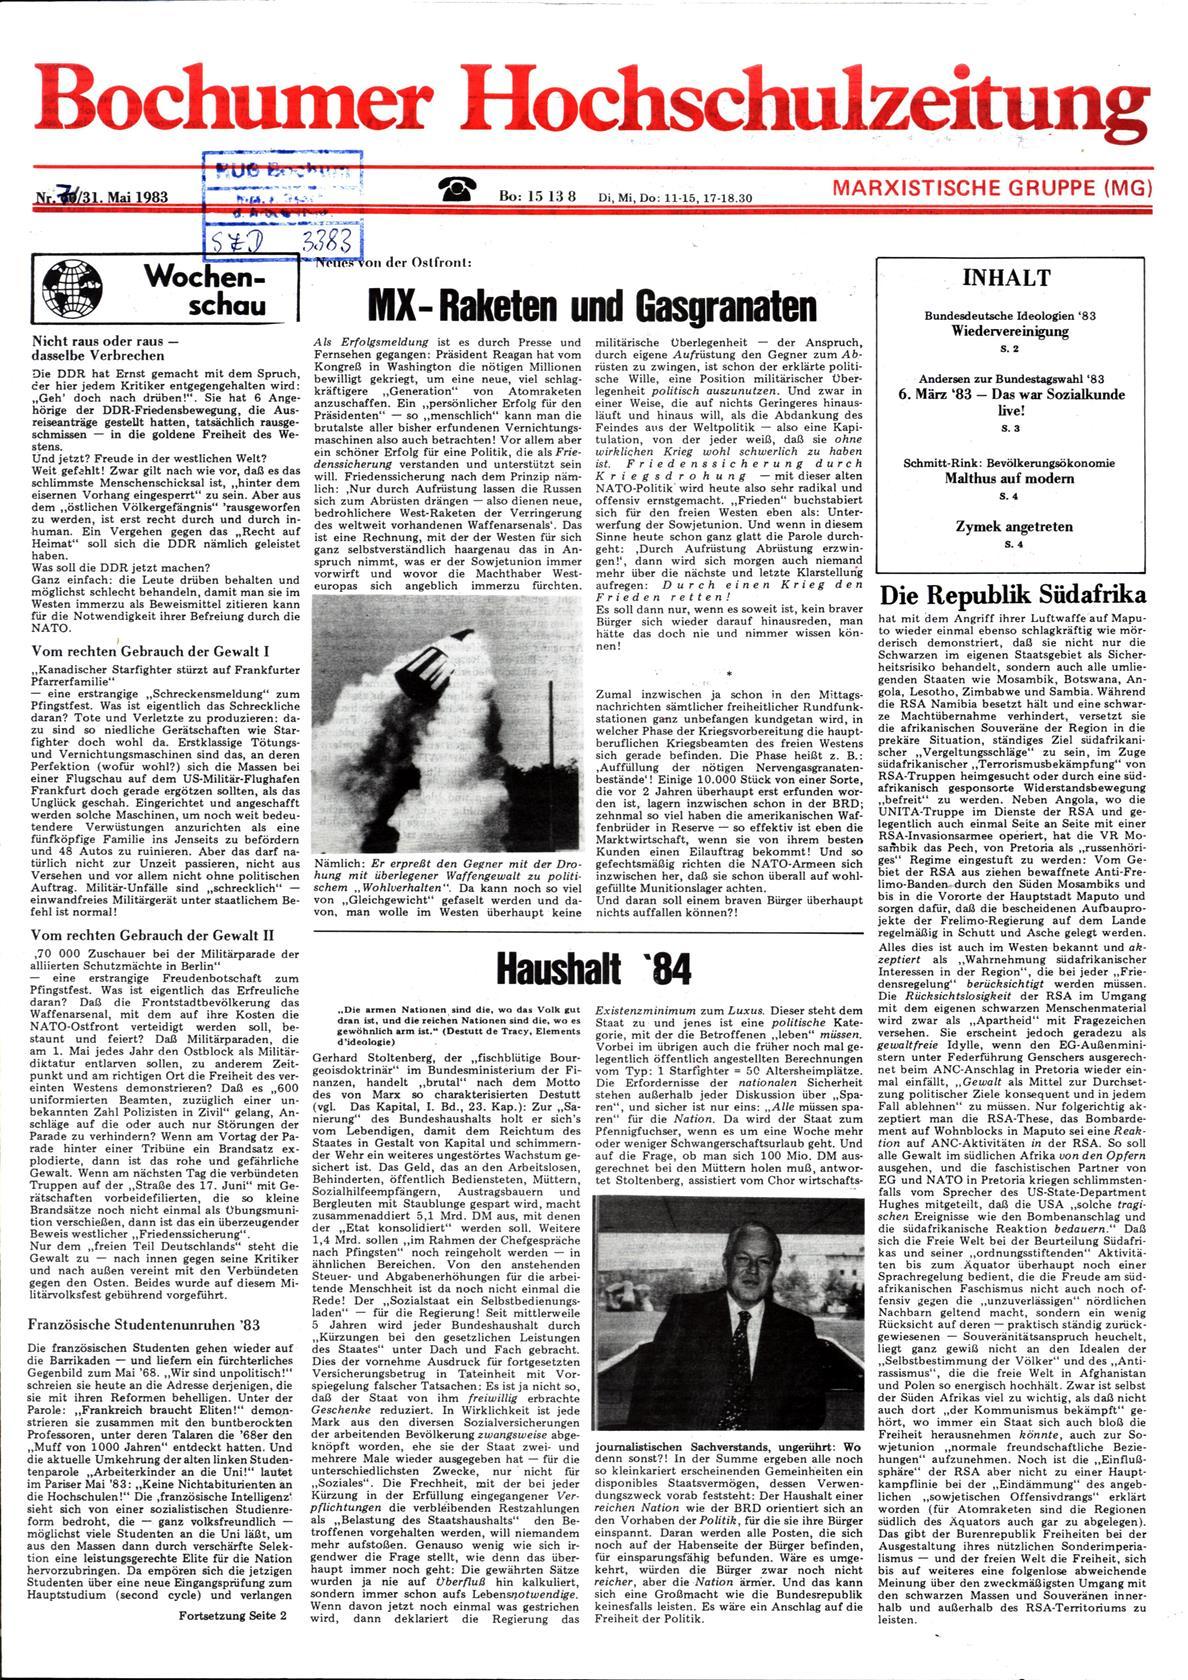 Bochum_BHZ_19830531_070_001